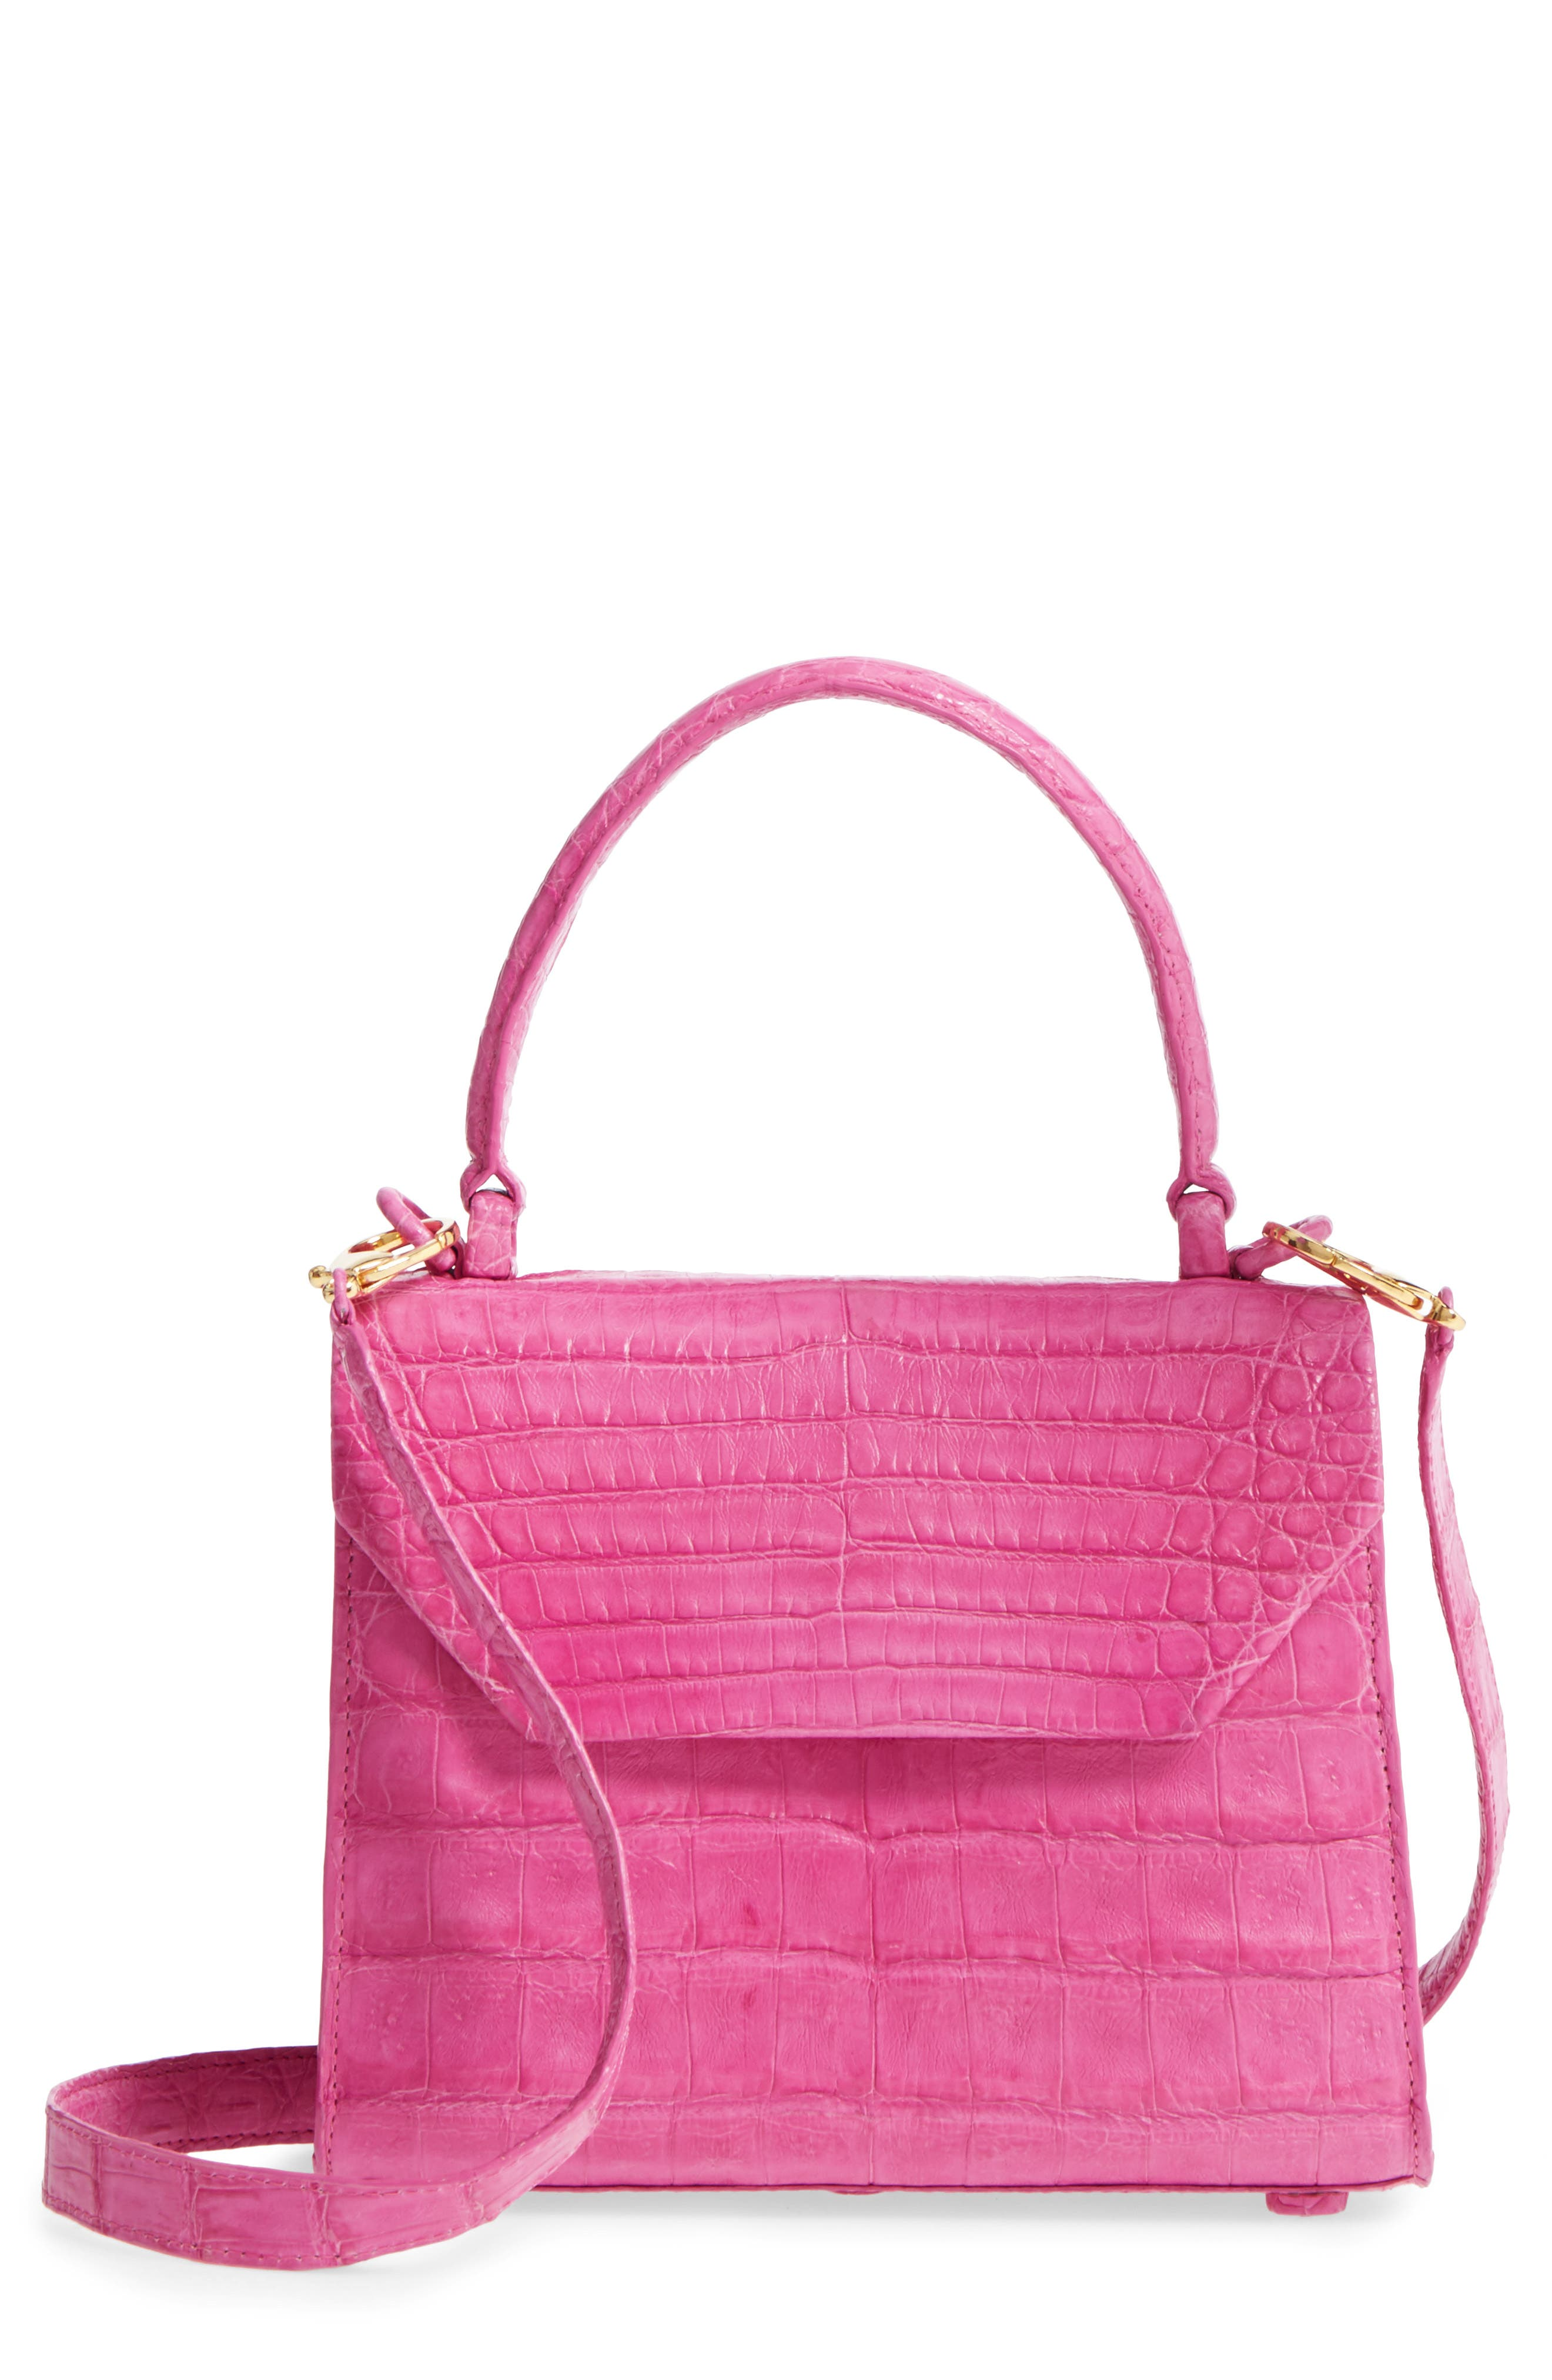 NANCY GONZALEZ, Mini Lily Genuine Crocodile Crossbody Bag, Main thumbnail 1, color, PINK MATTE